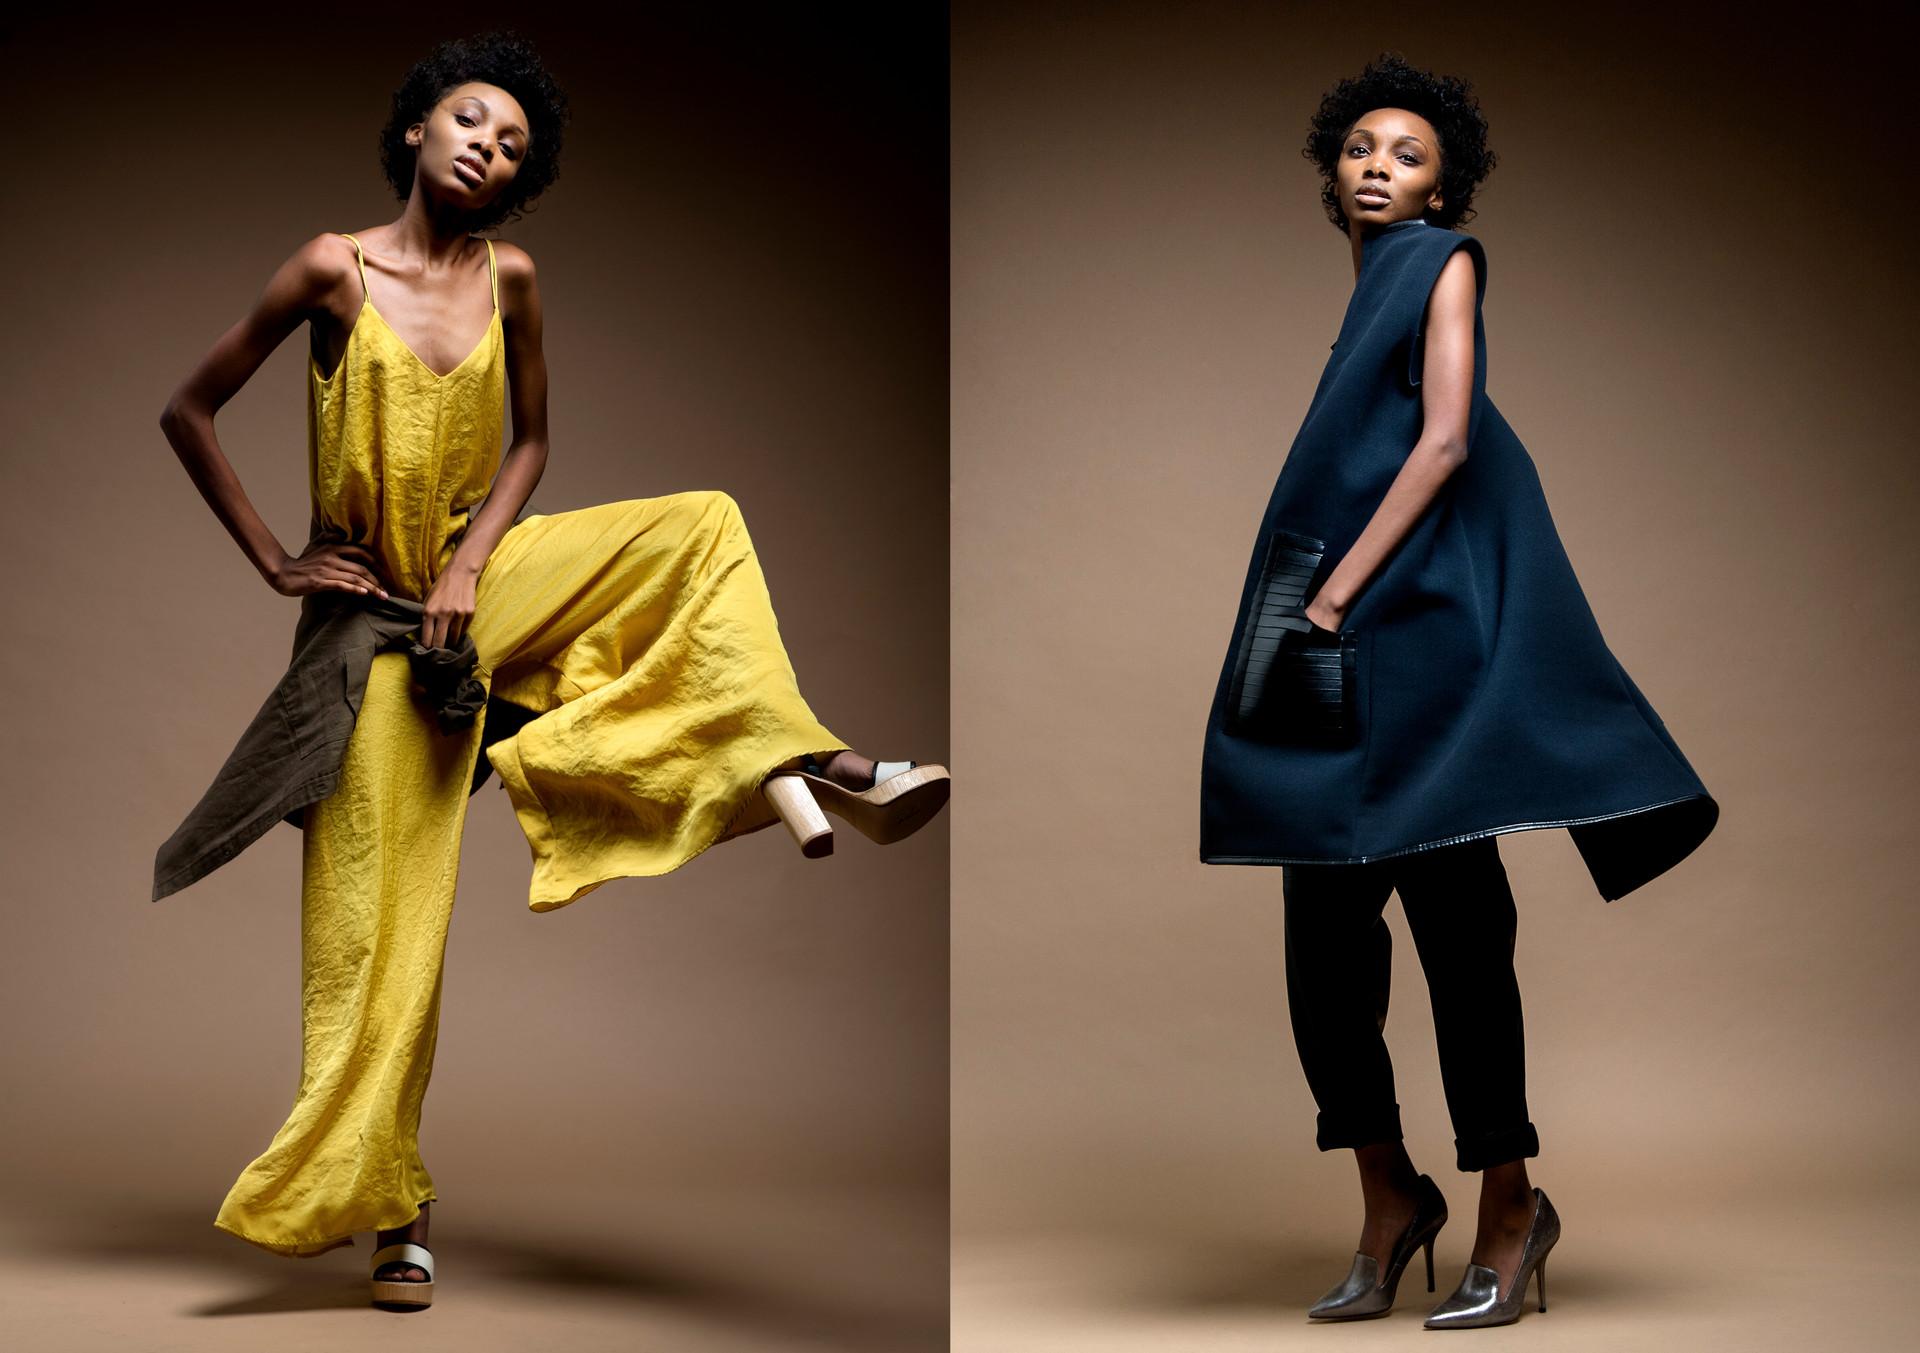 chicago fashion photographer, chicago fashion photography, chicago fashion, chicago editorial photographer, chicago fashion, chicago womens fashion photographer, chicago modelling photographer, chicago models, chicago model, chicago modelling photographer